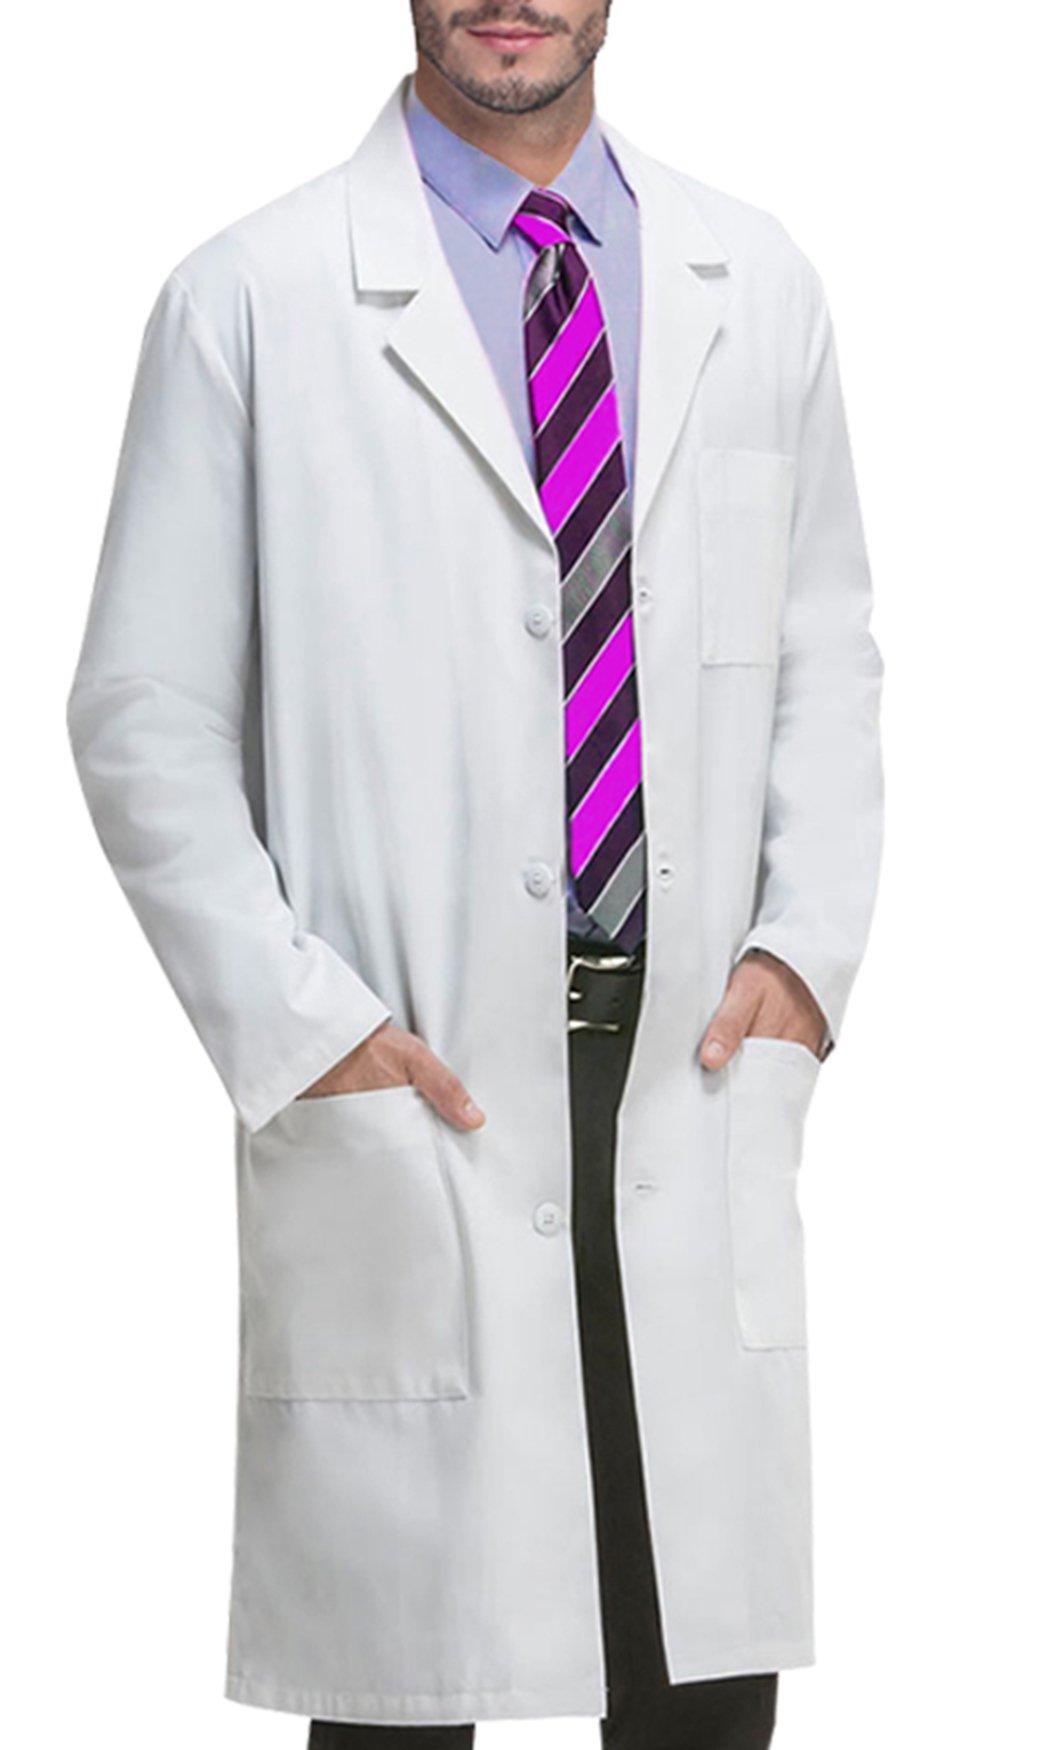 VOGRYE Professional Lab Coat for Women Men Long Sleeve, White, Unisex. (M, White2)